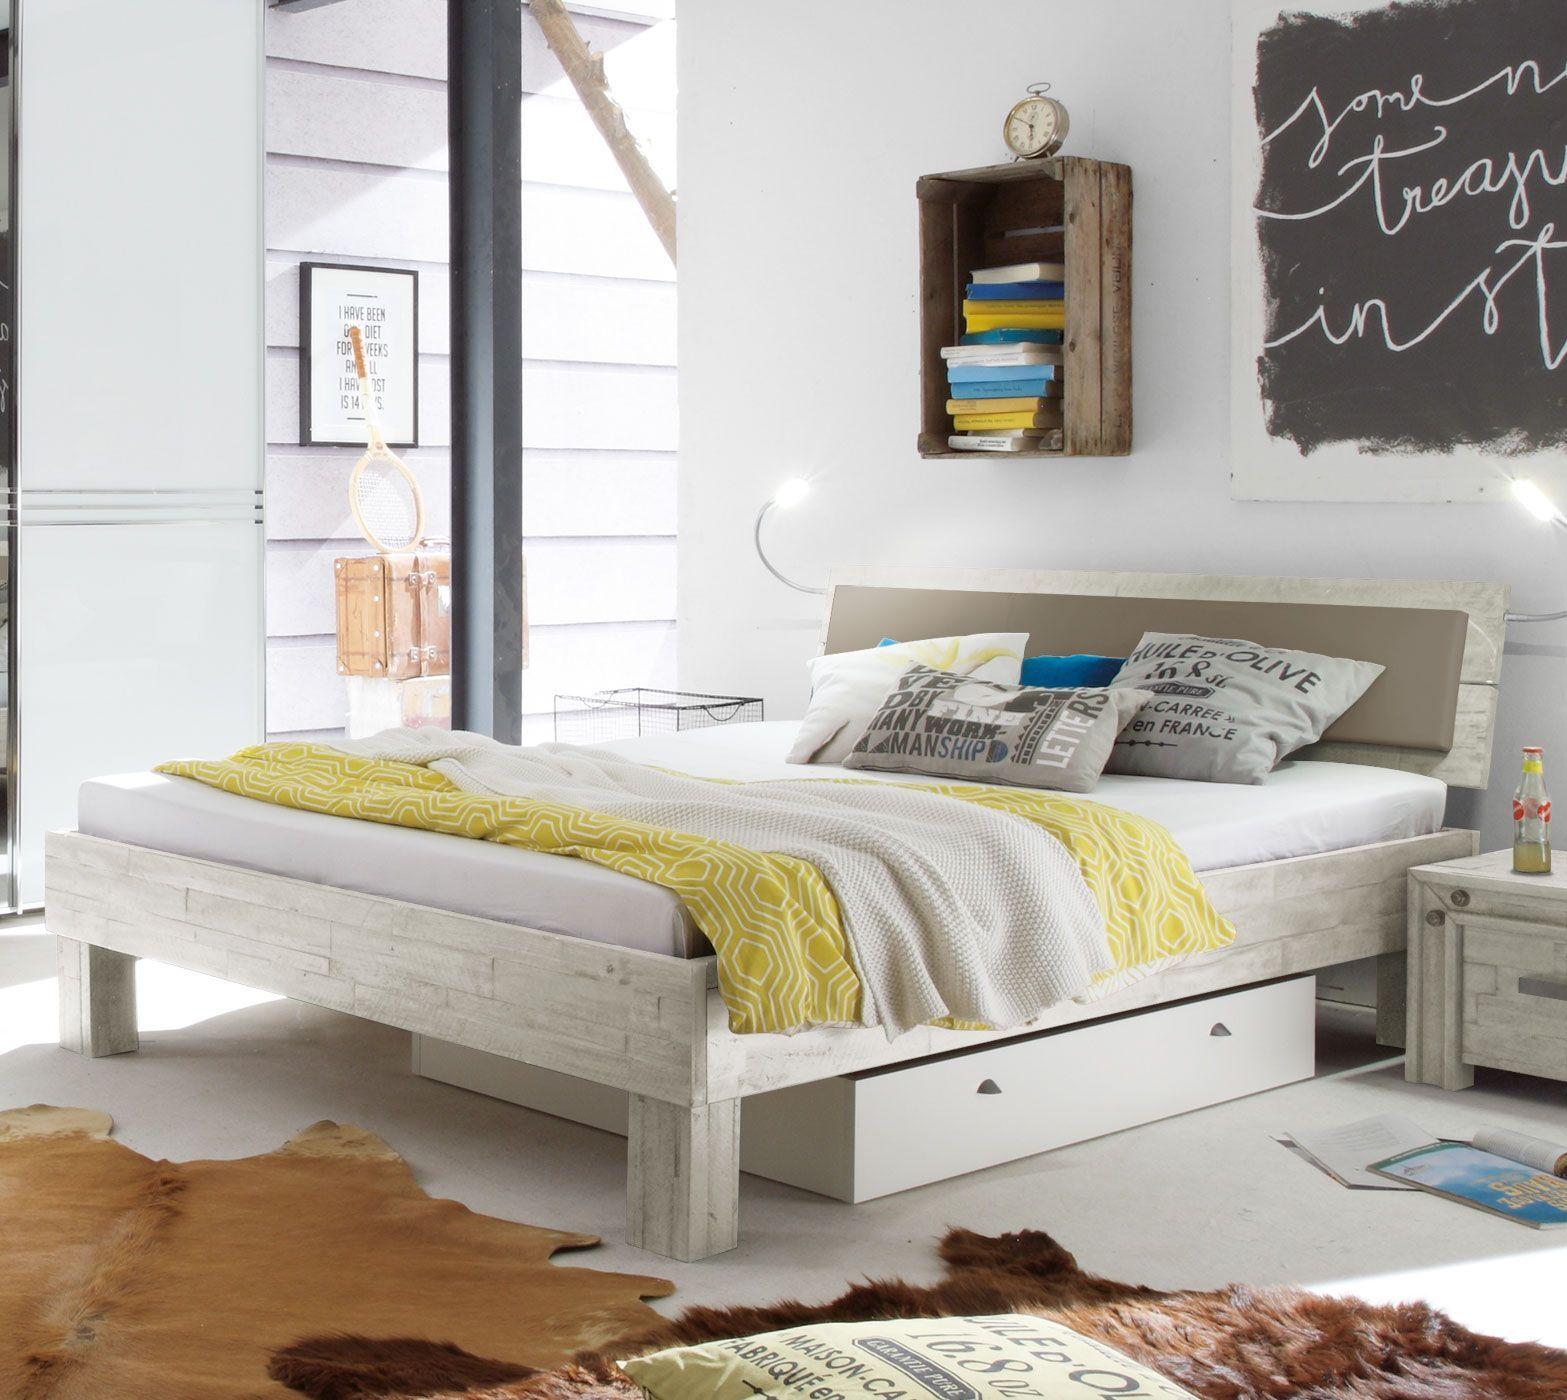 Bett Im Industrial Design Aus Akazie Caldera Betten De